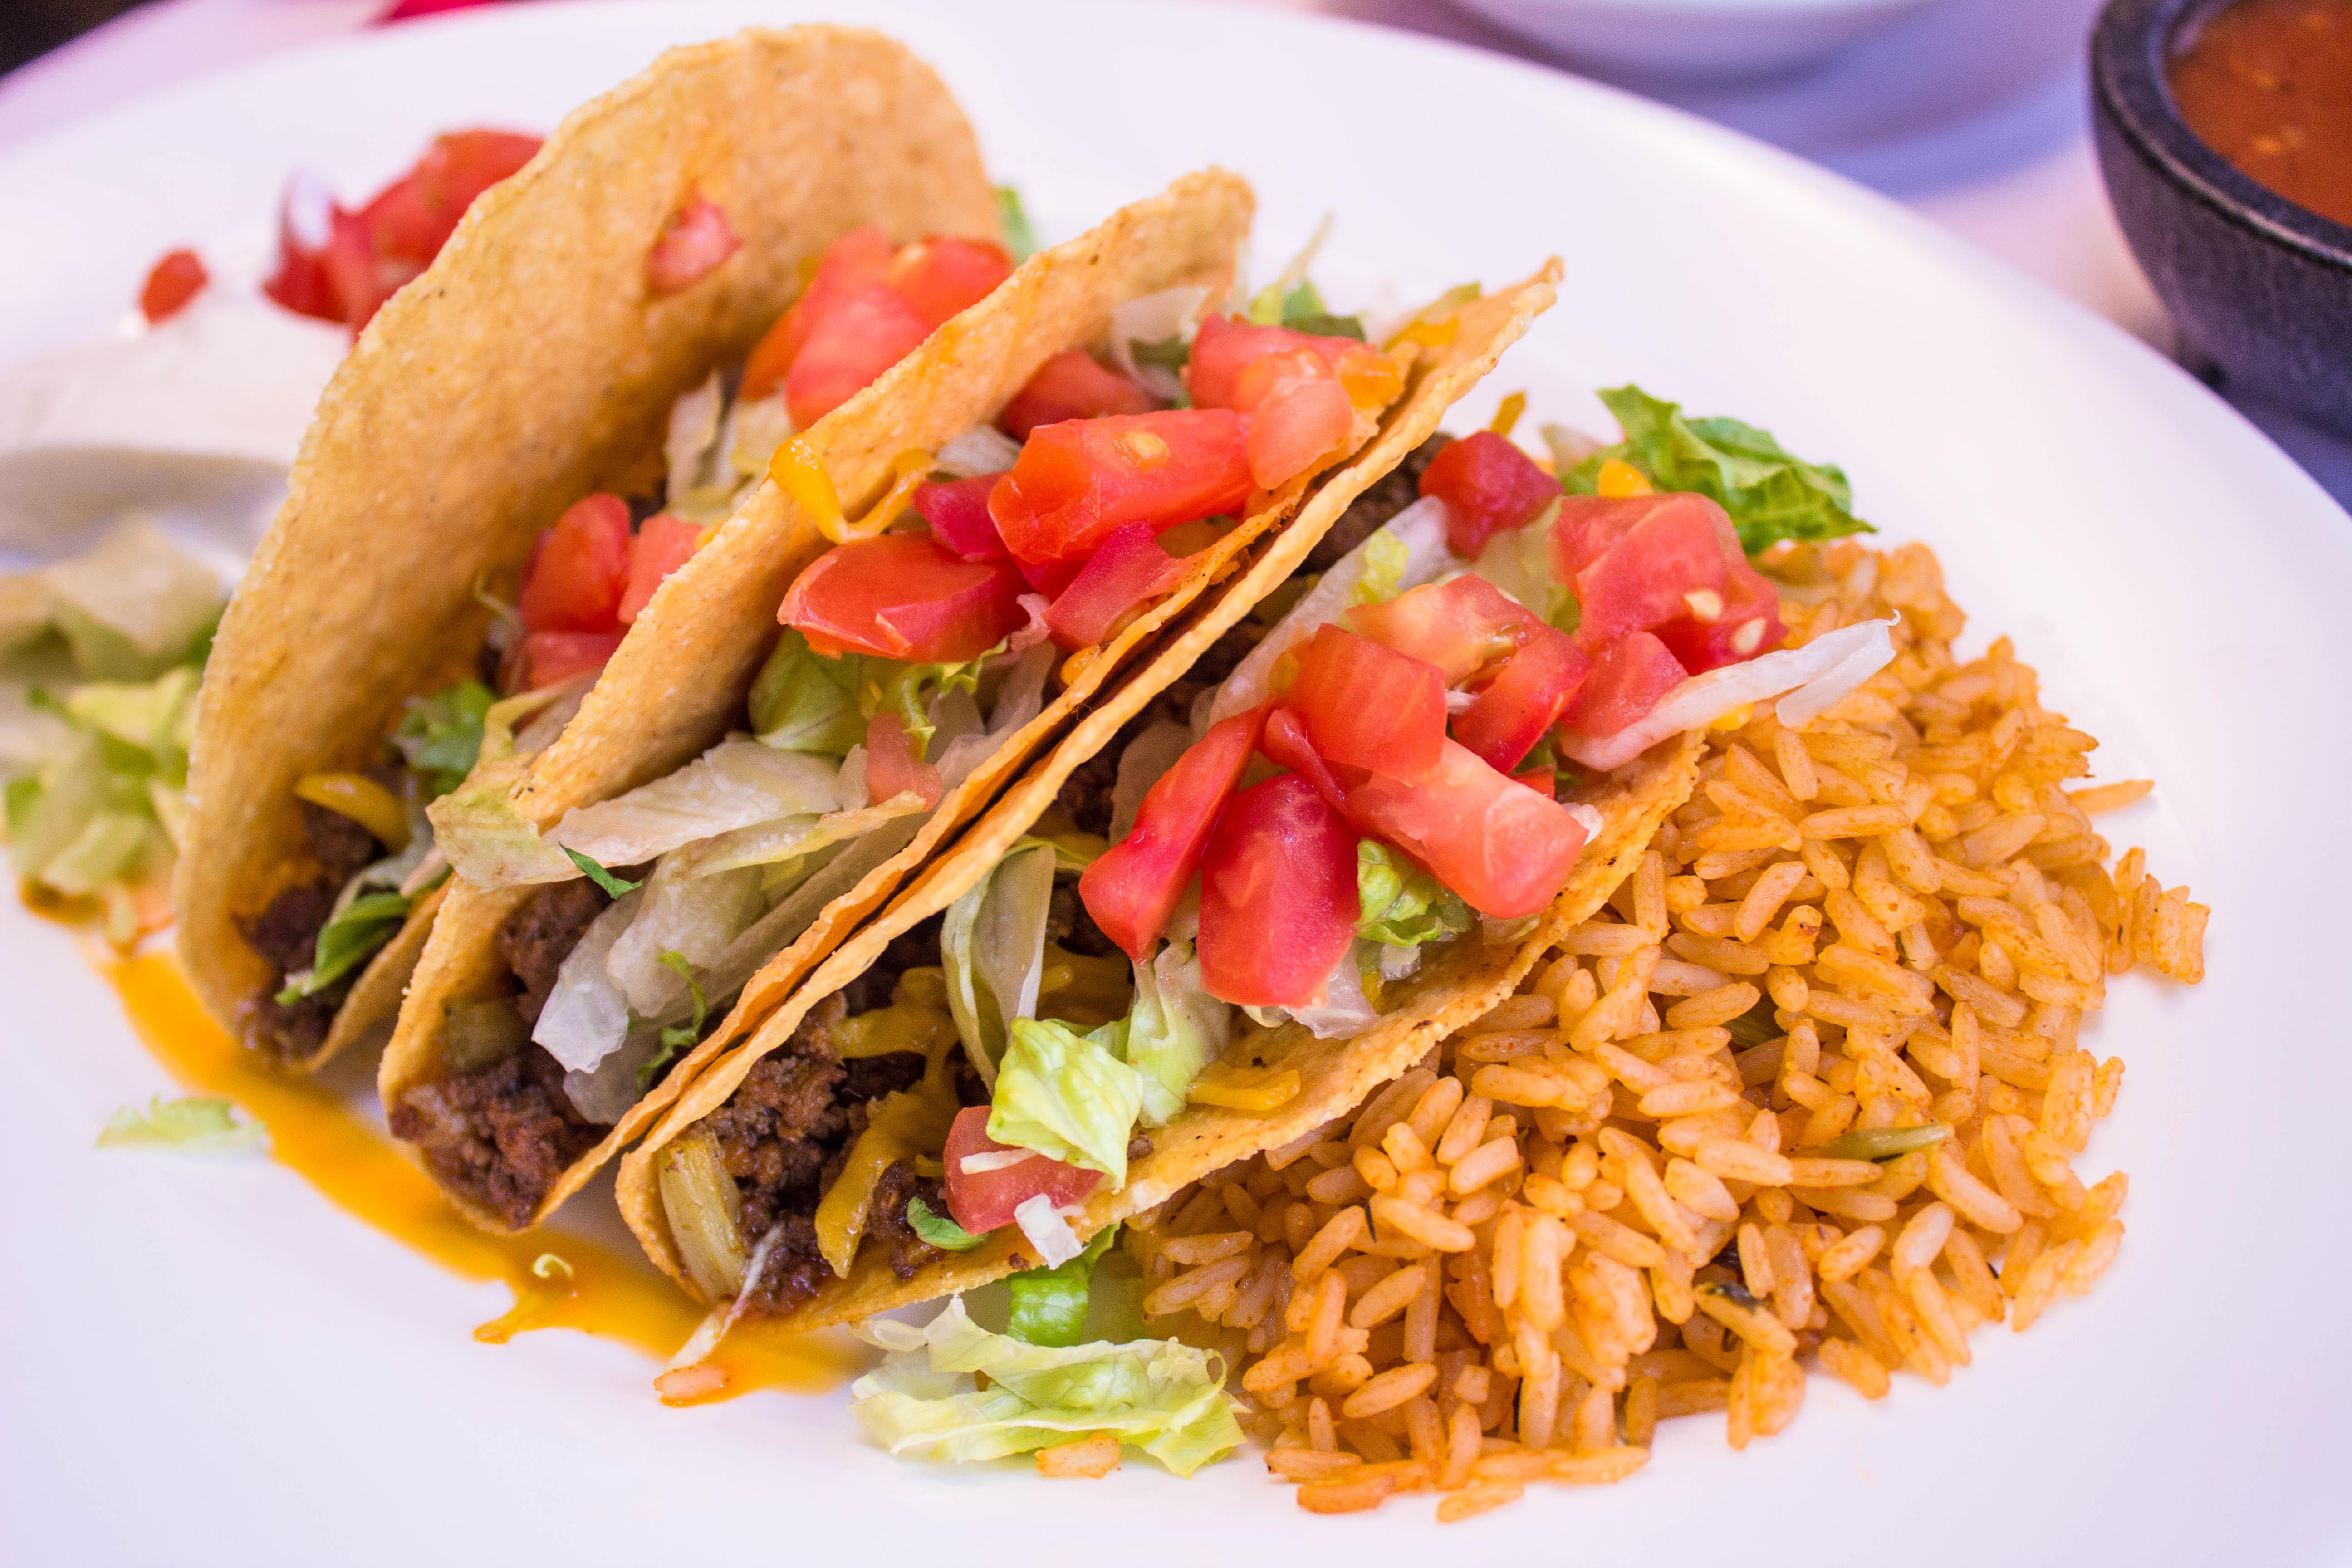 Crispy Taco Dinner